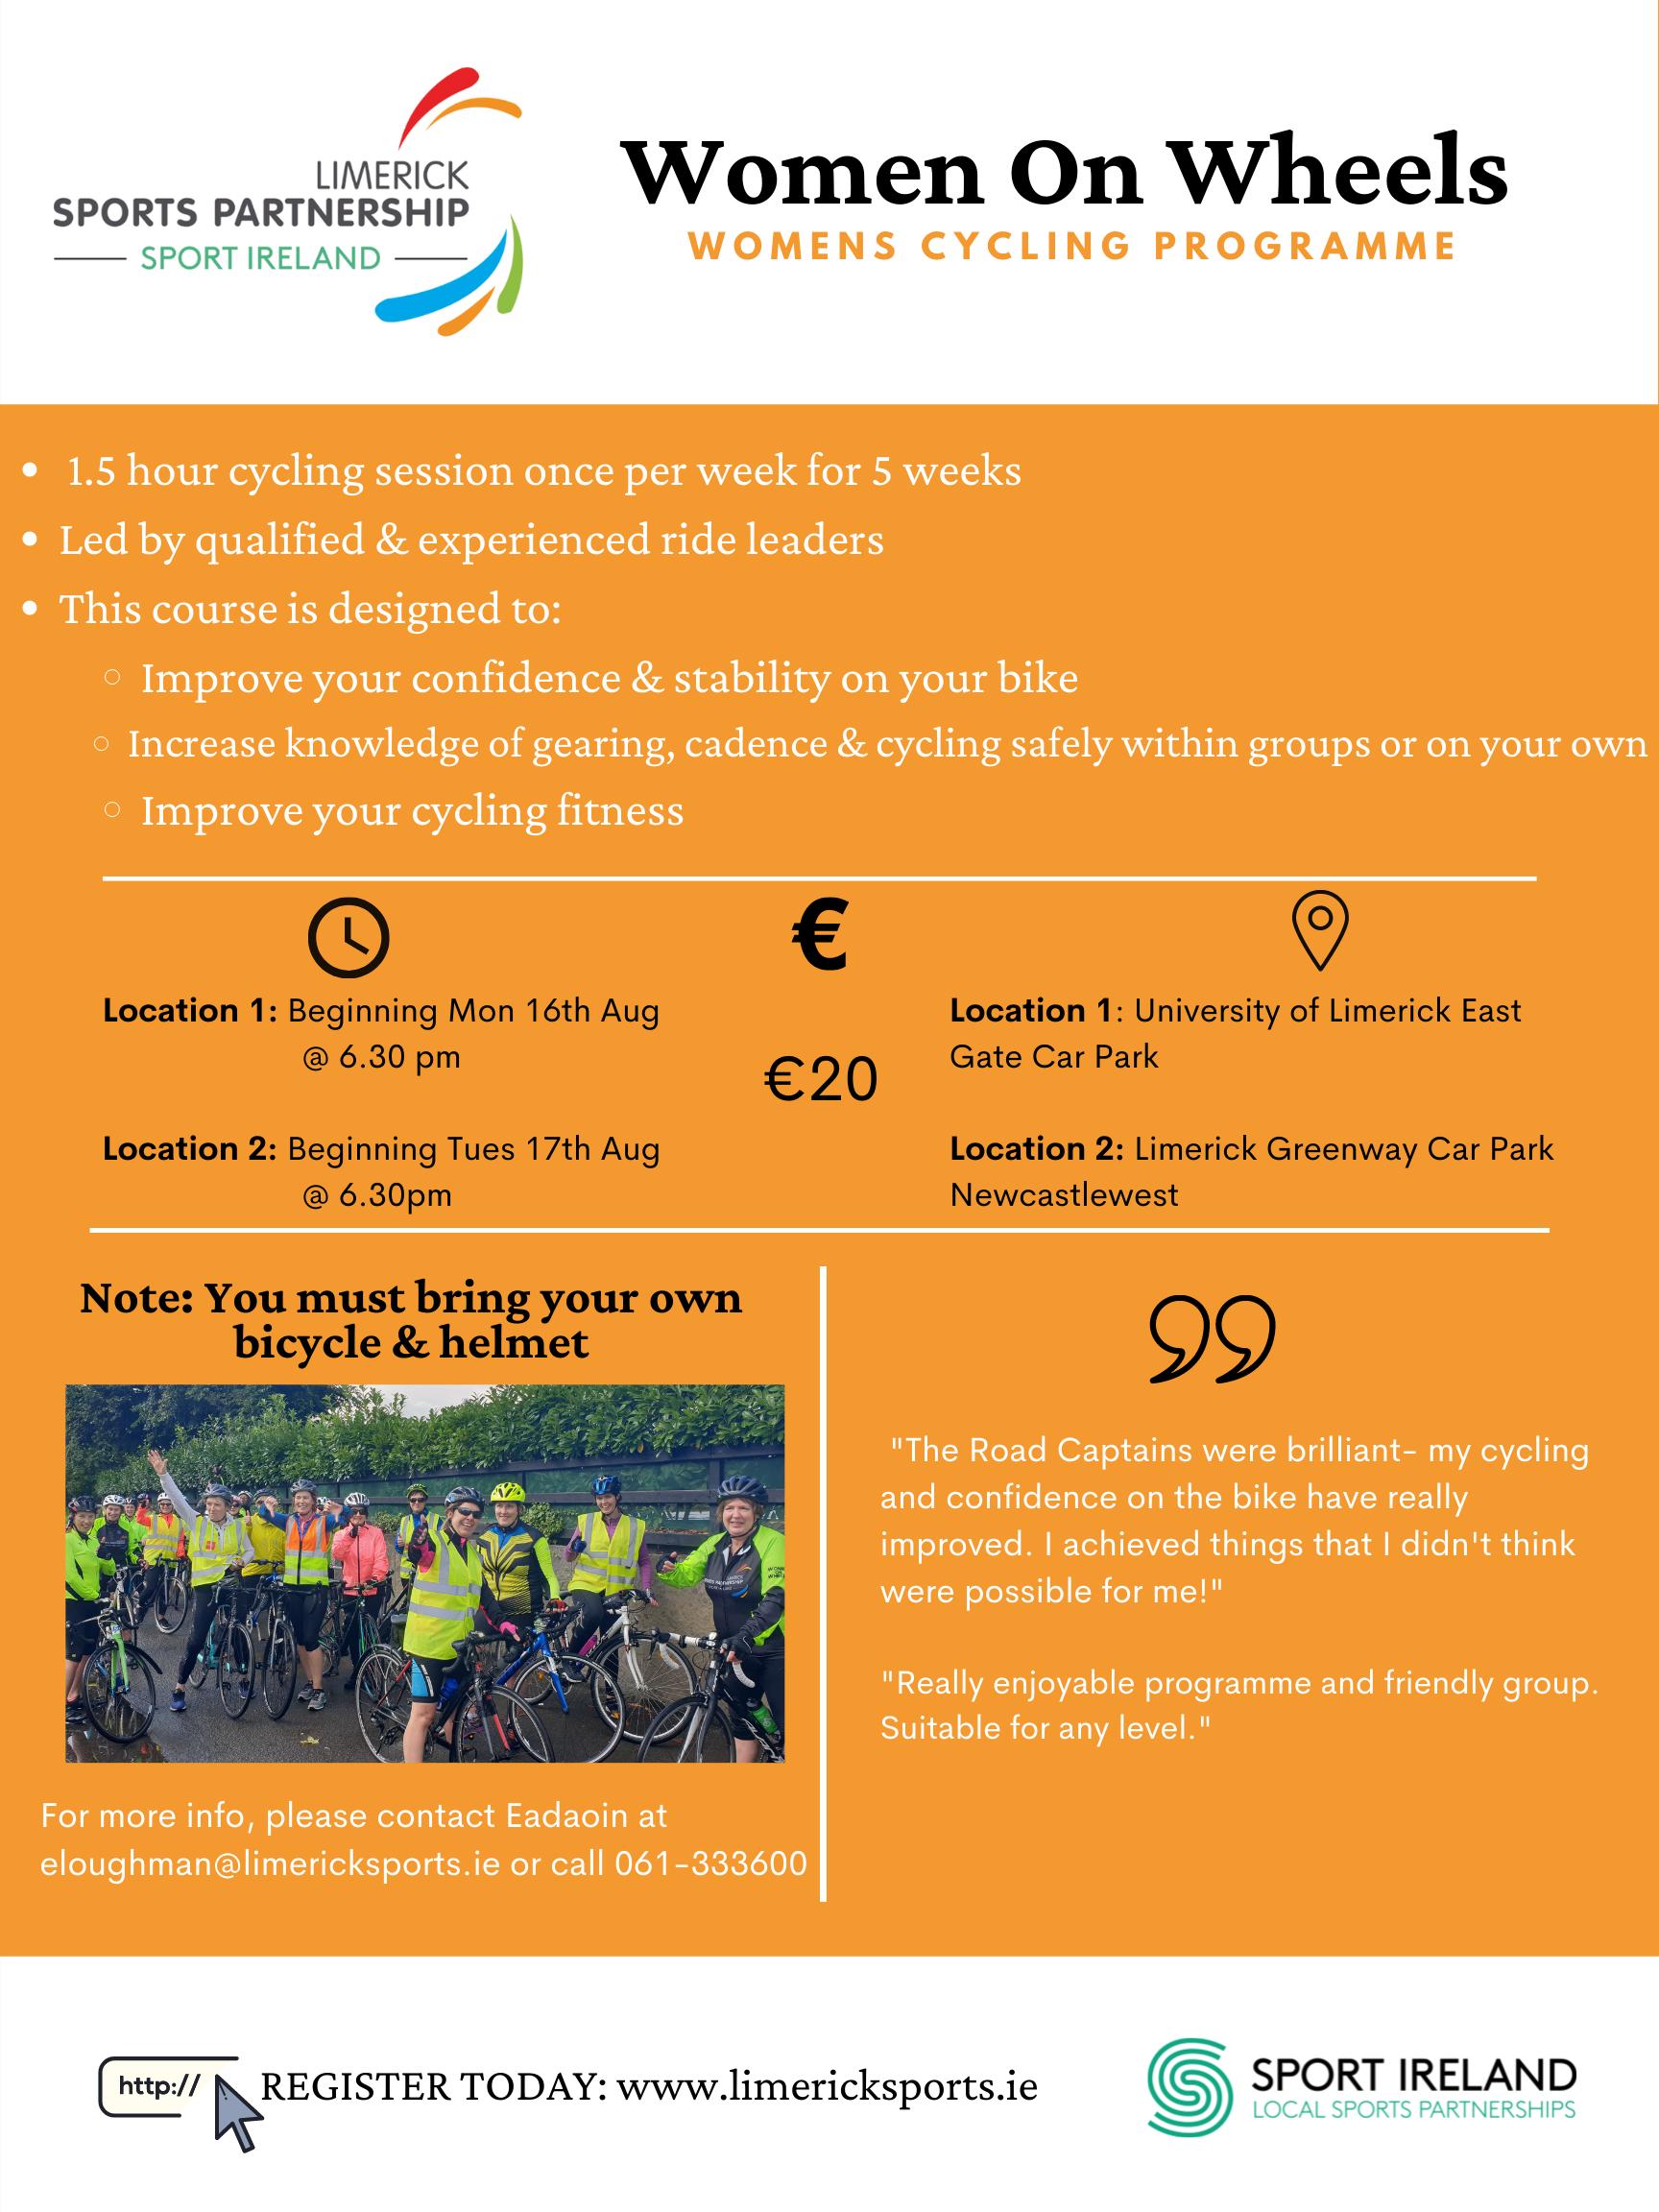 Women's Cycling Programme